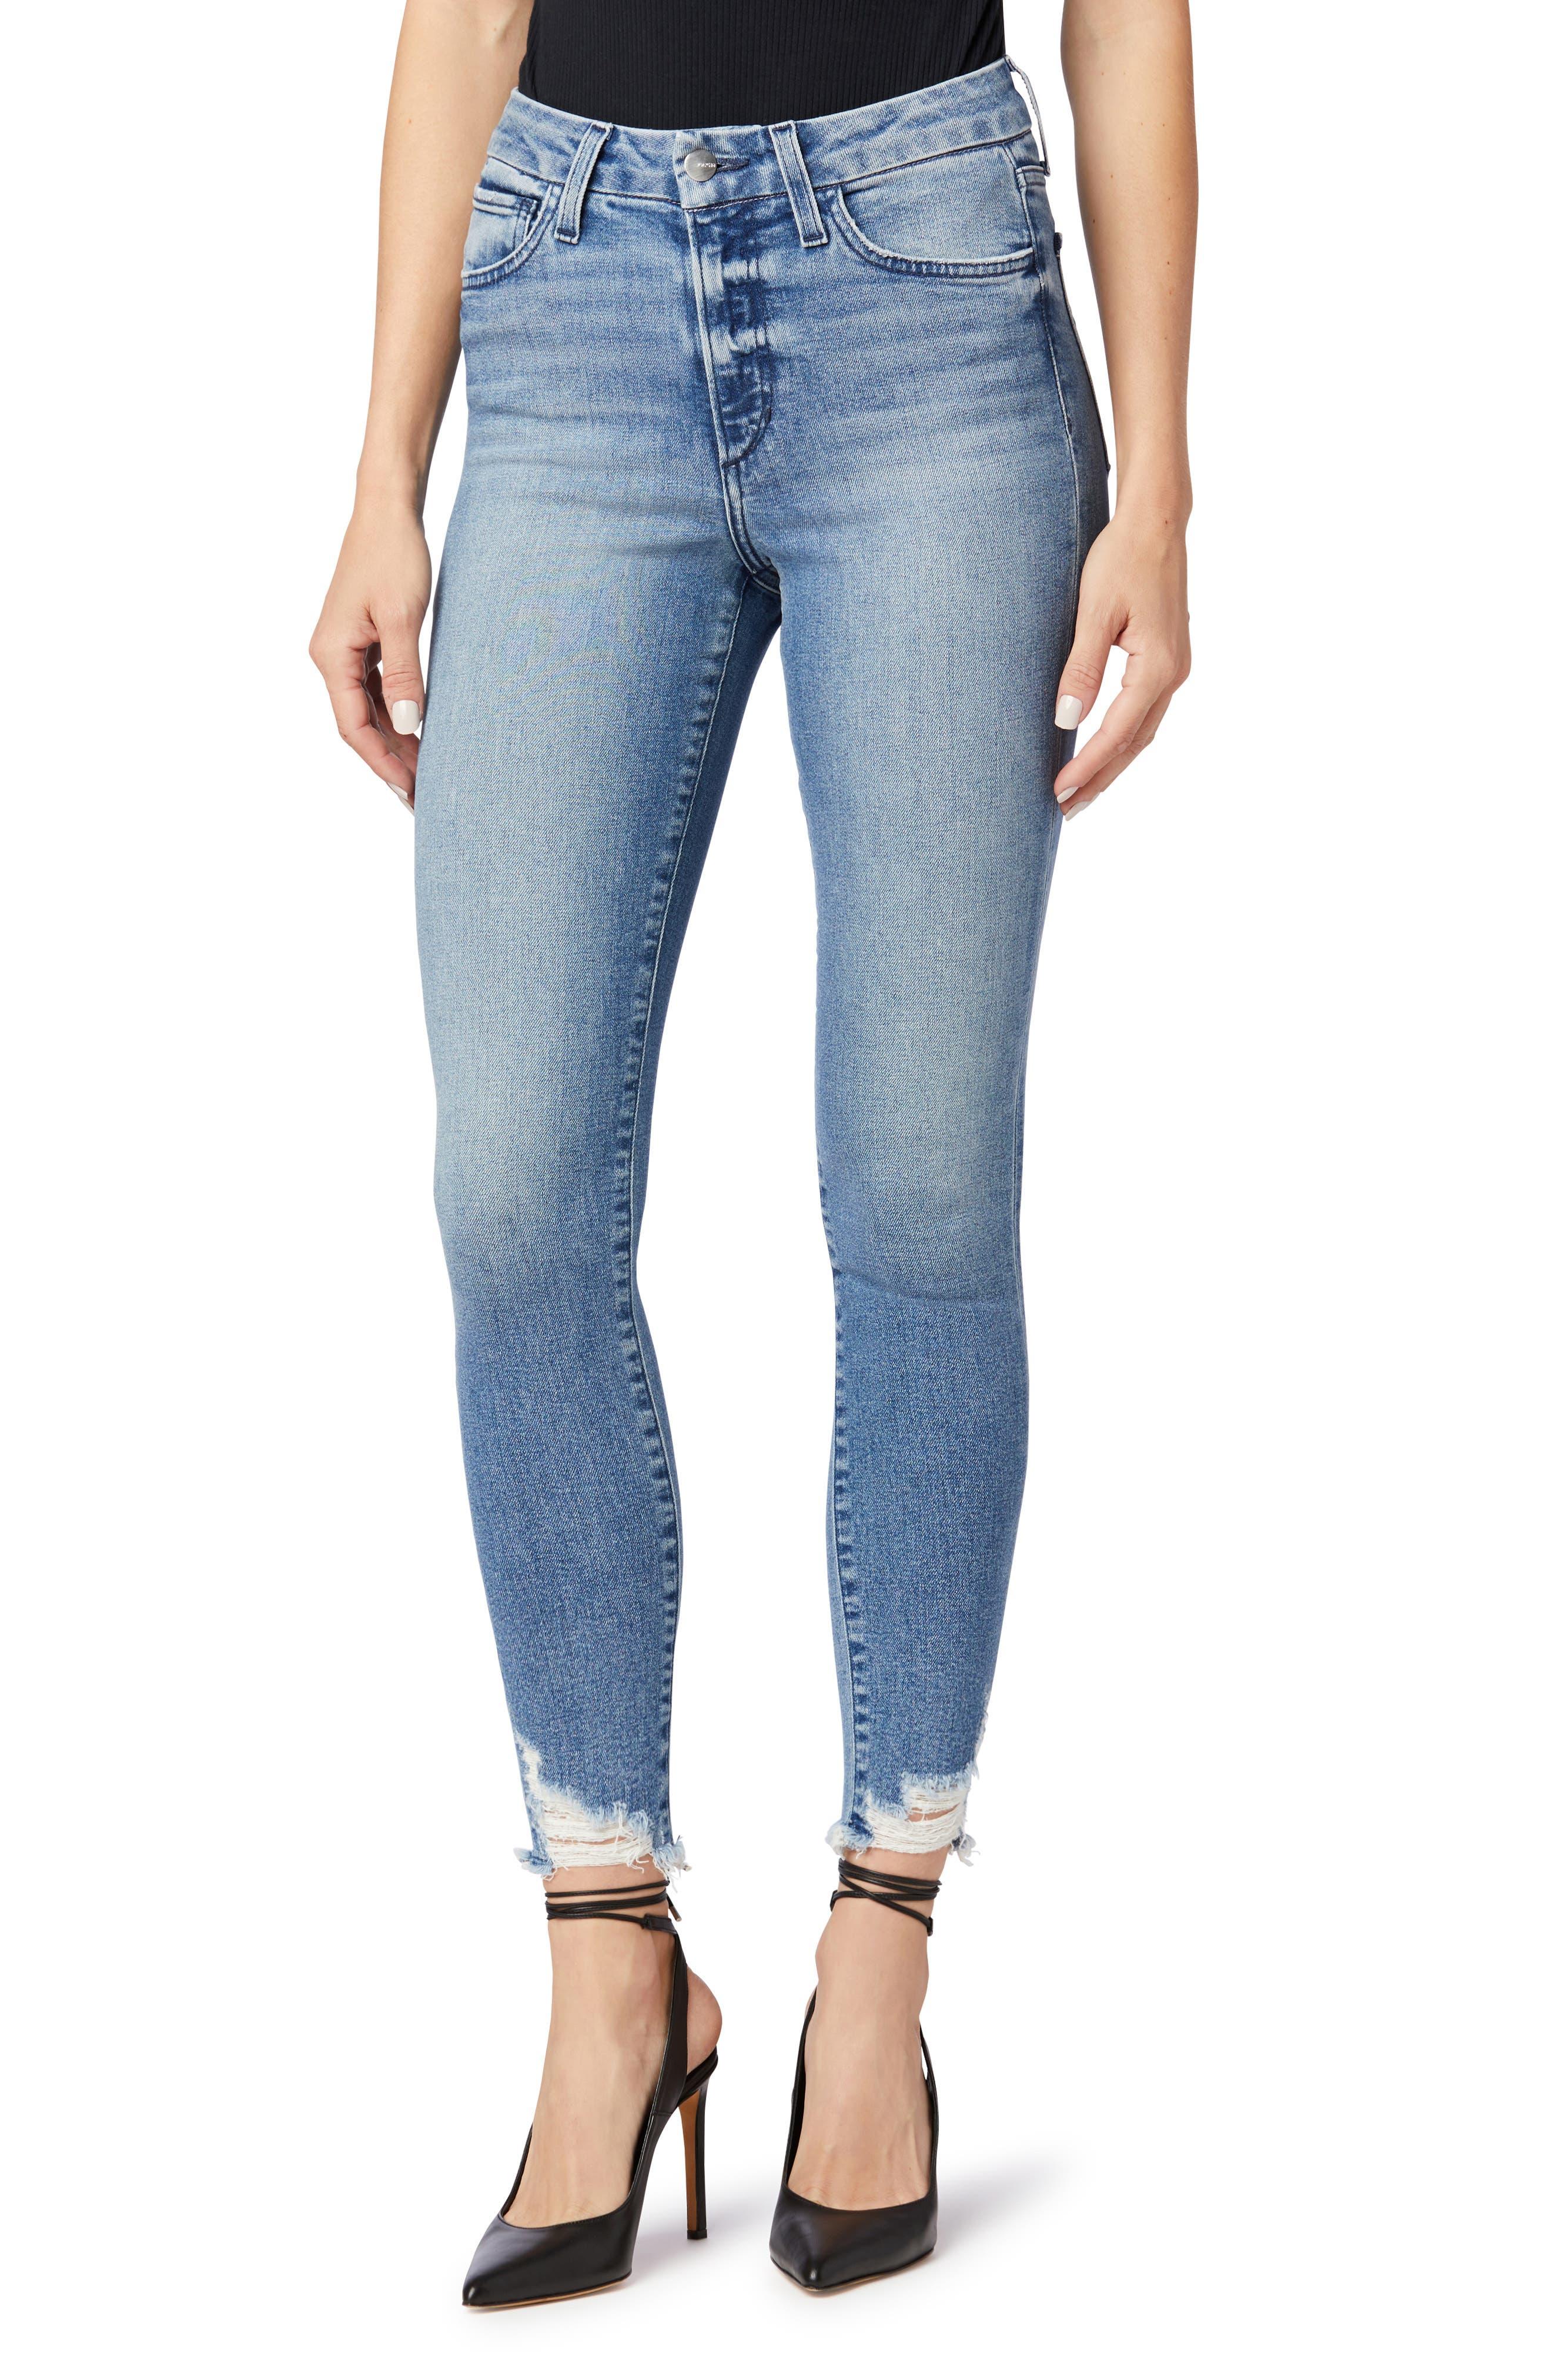 The Hi Honey High Waist Skinny Jeans